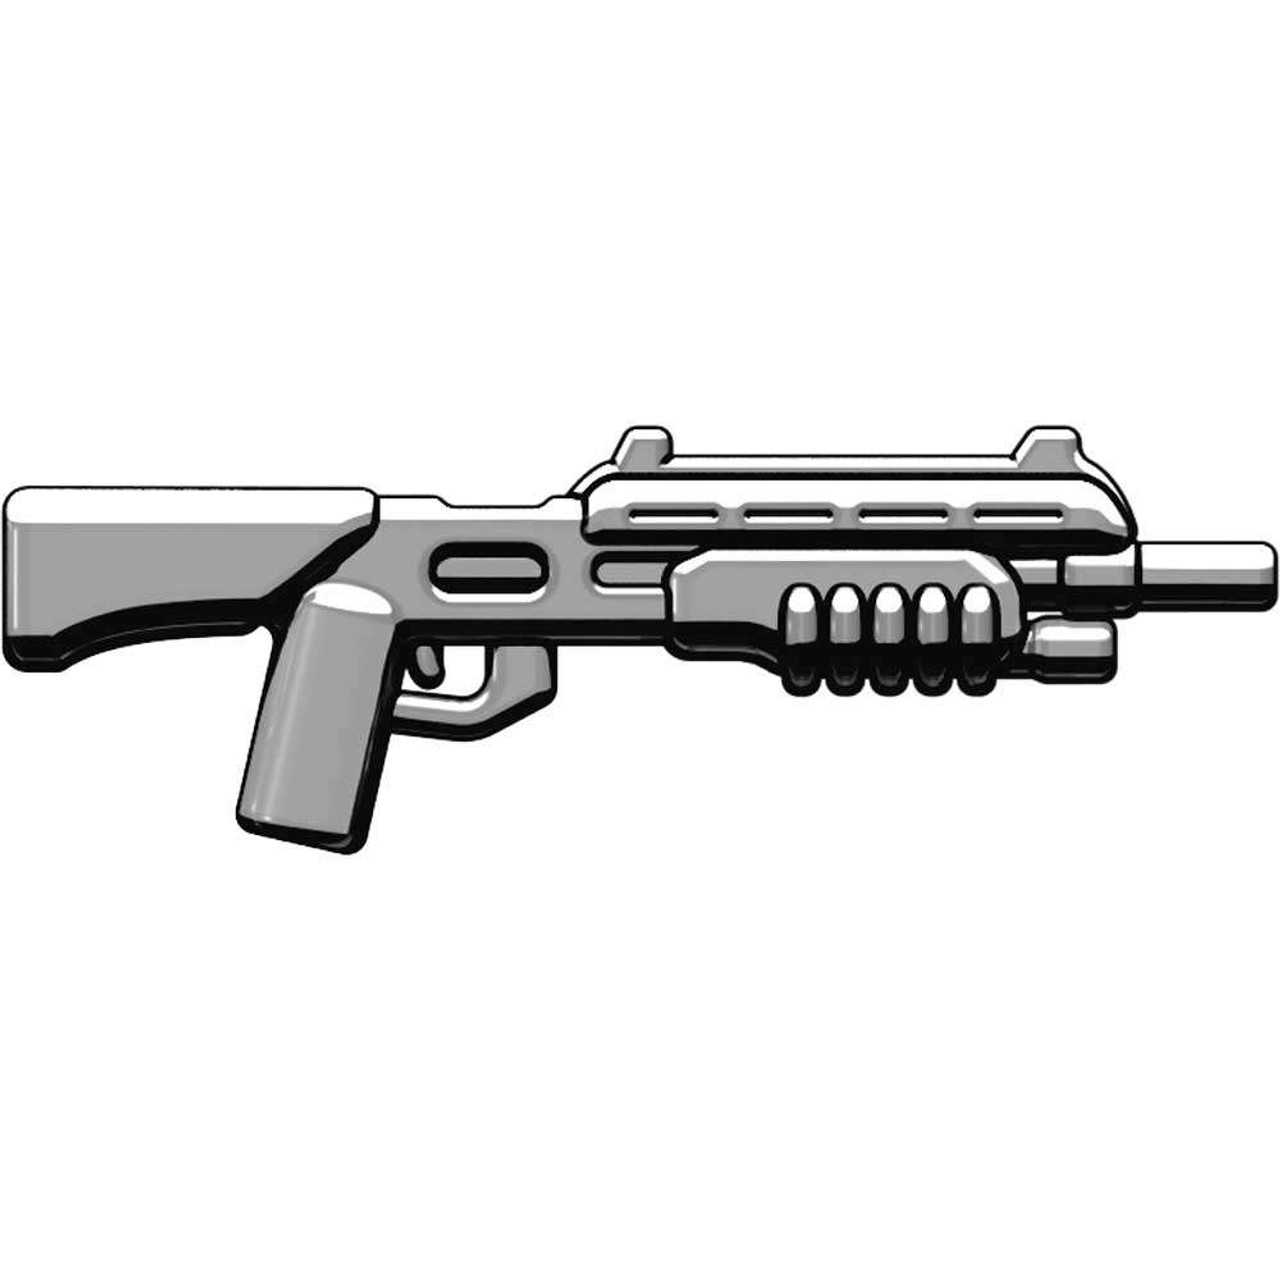 BrickArms Weapons XMS Experimental Magnum Shotgun 2.5-Inch [Titanium]